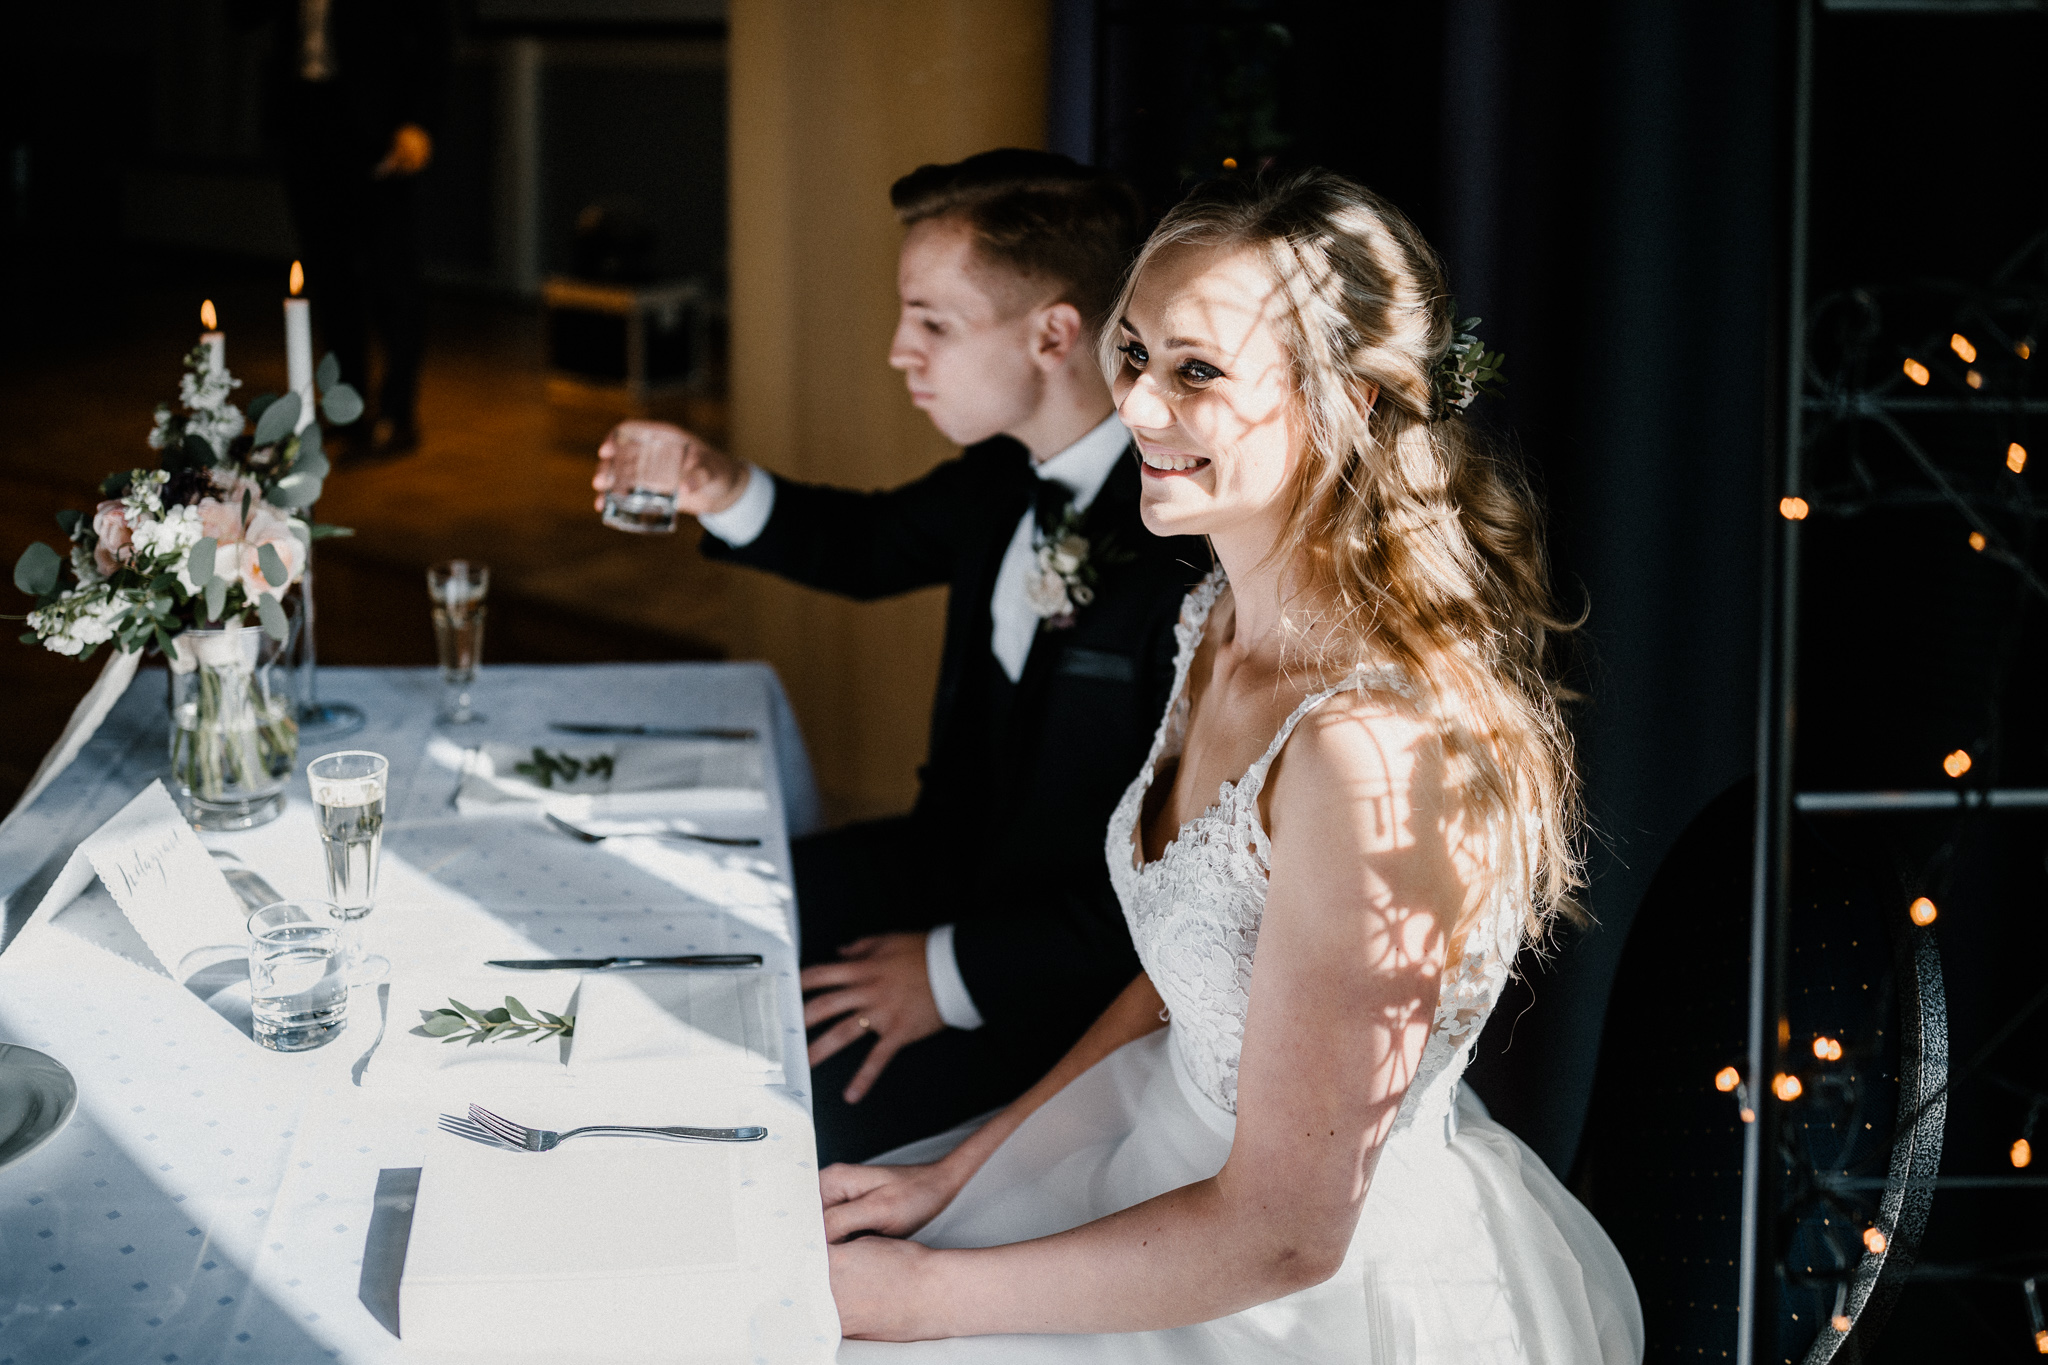 Johanna + Mikko - Tampere - Photo by Patrick Karkkolainen Wedding Photographer-96.jpg